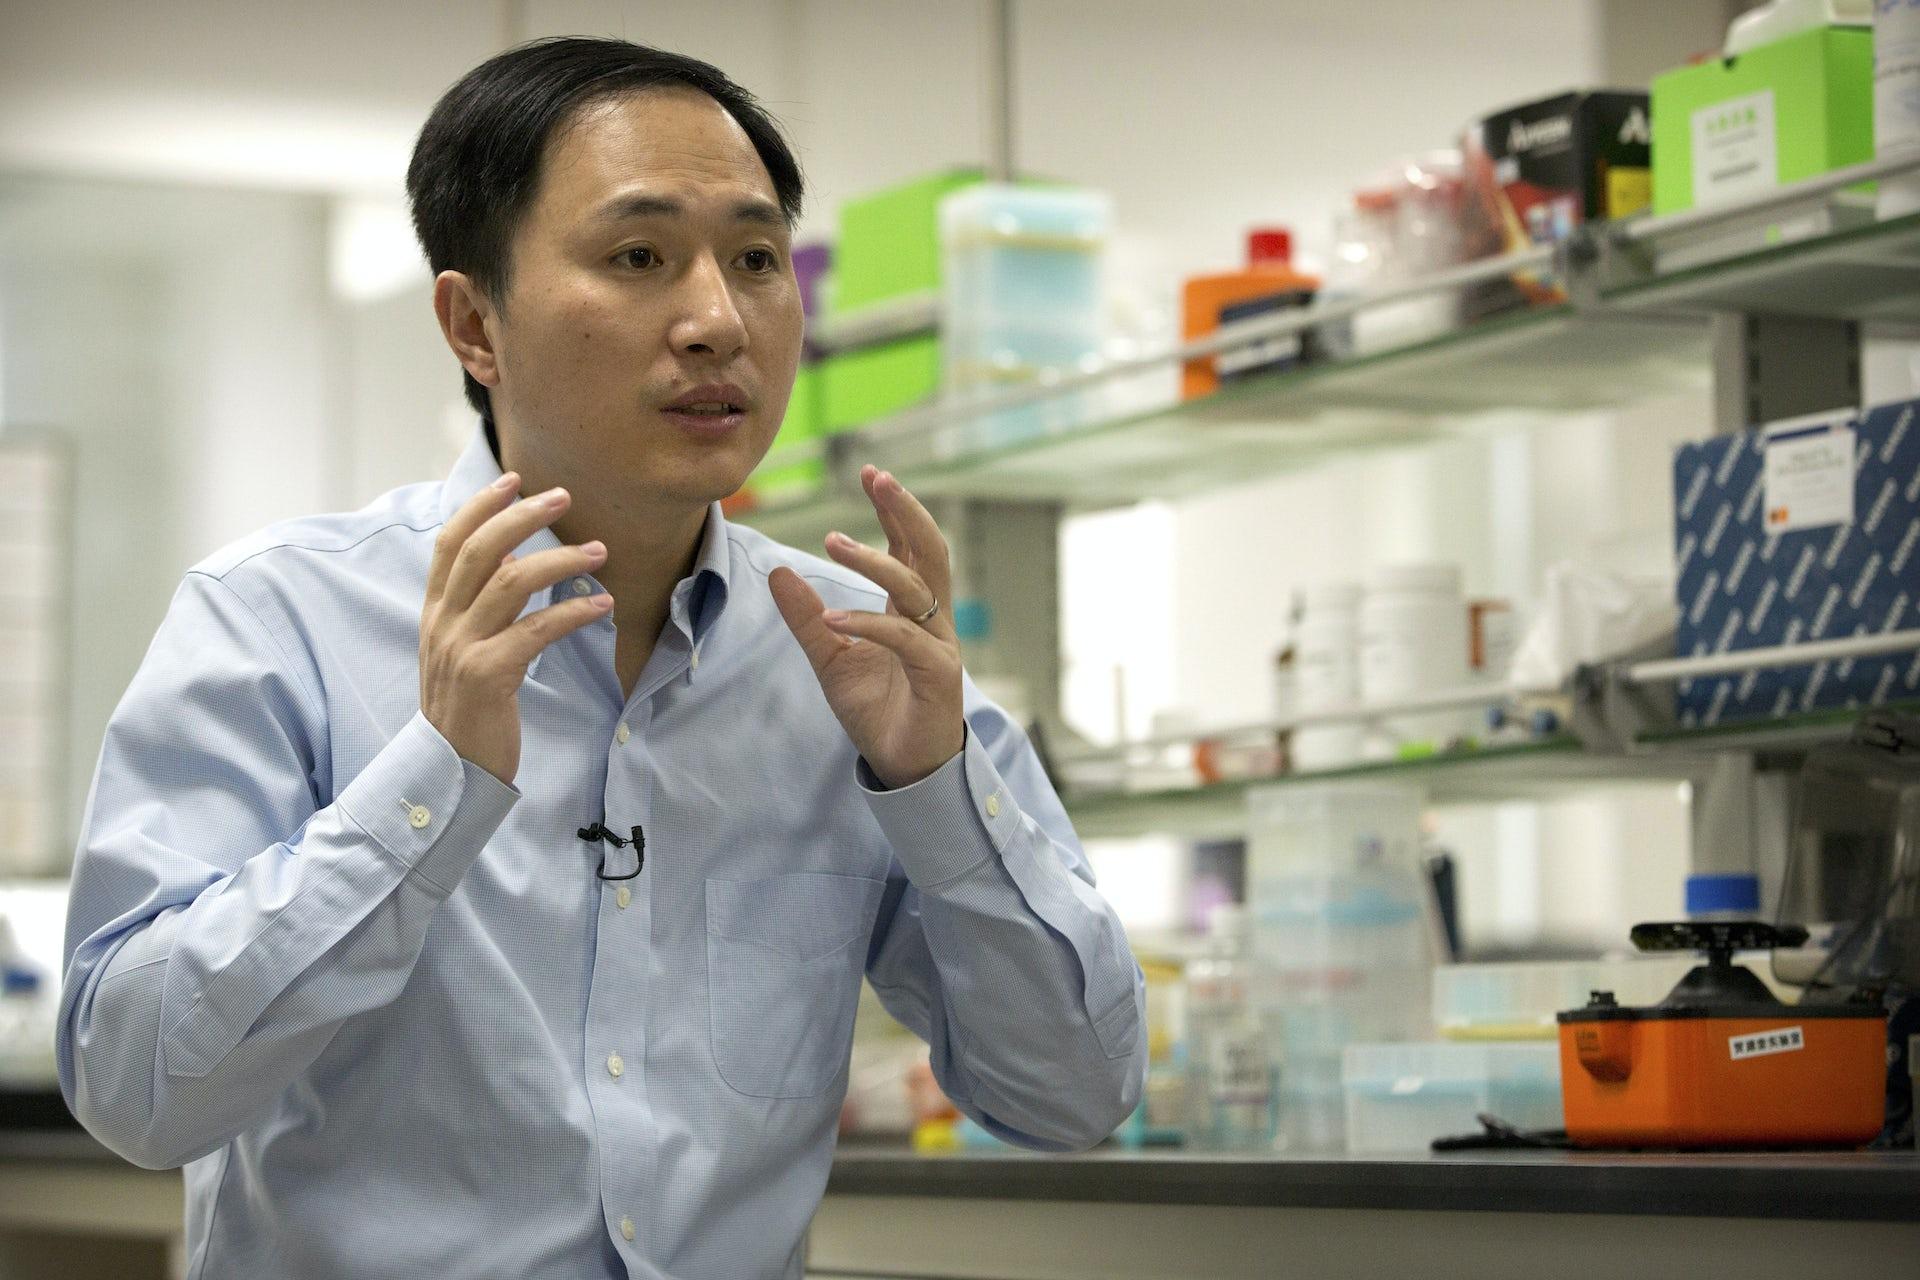 He Jiankui has a lot to explain going forward. AP Photo/Mark Schiefelbein